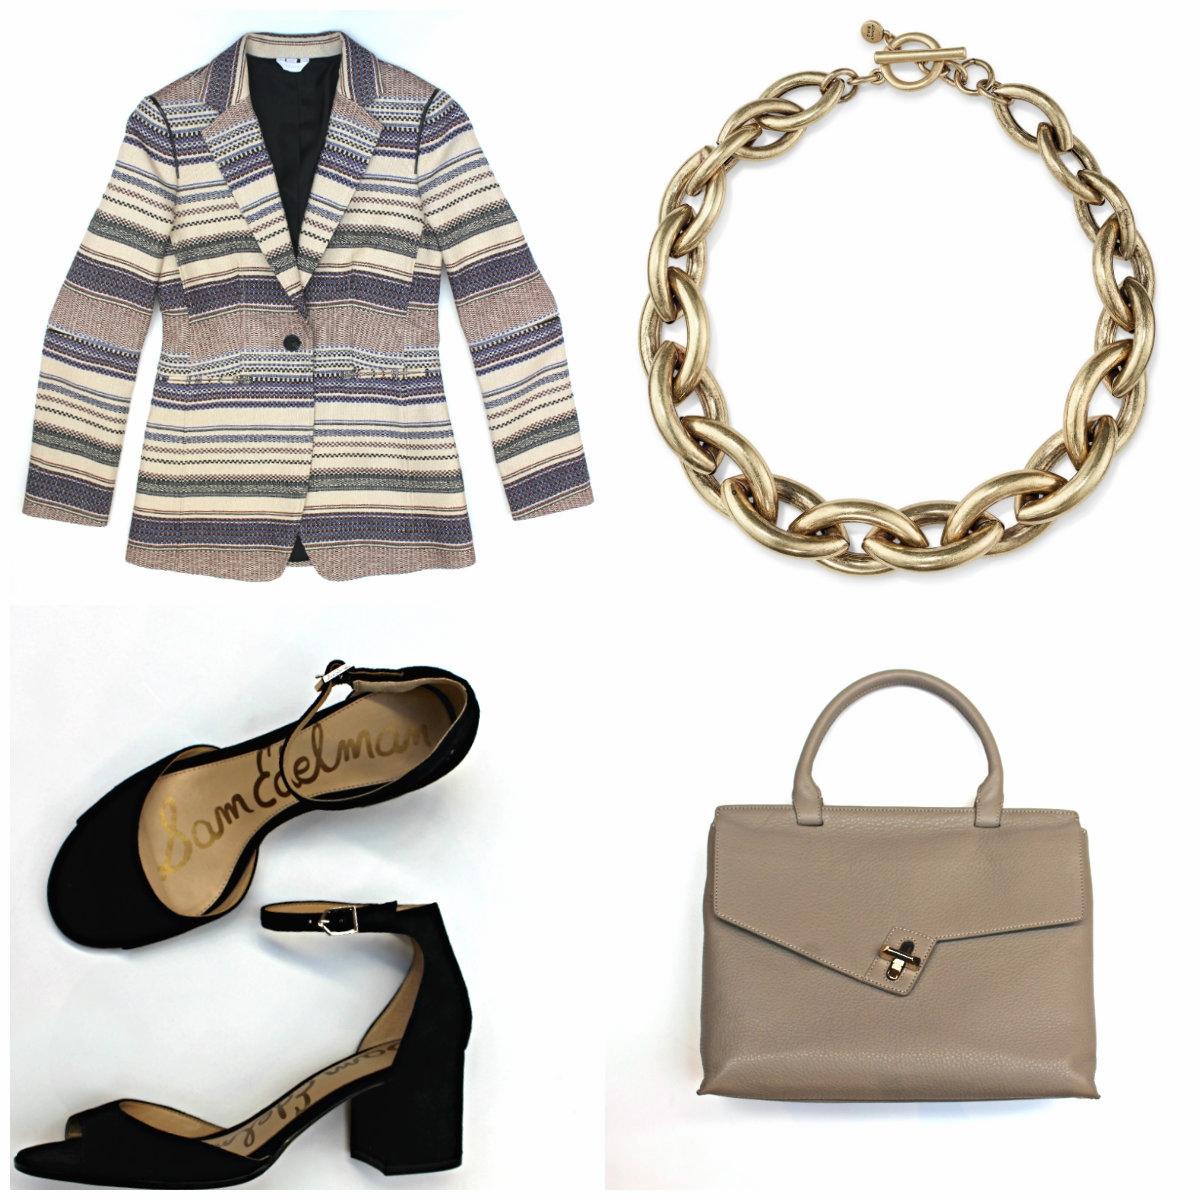 Sosken Blazer $395 Jenny Bird Sloan Collar $145 Sam Edelman Susie Heels $160 Ela Leather Lady Bag $485